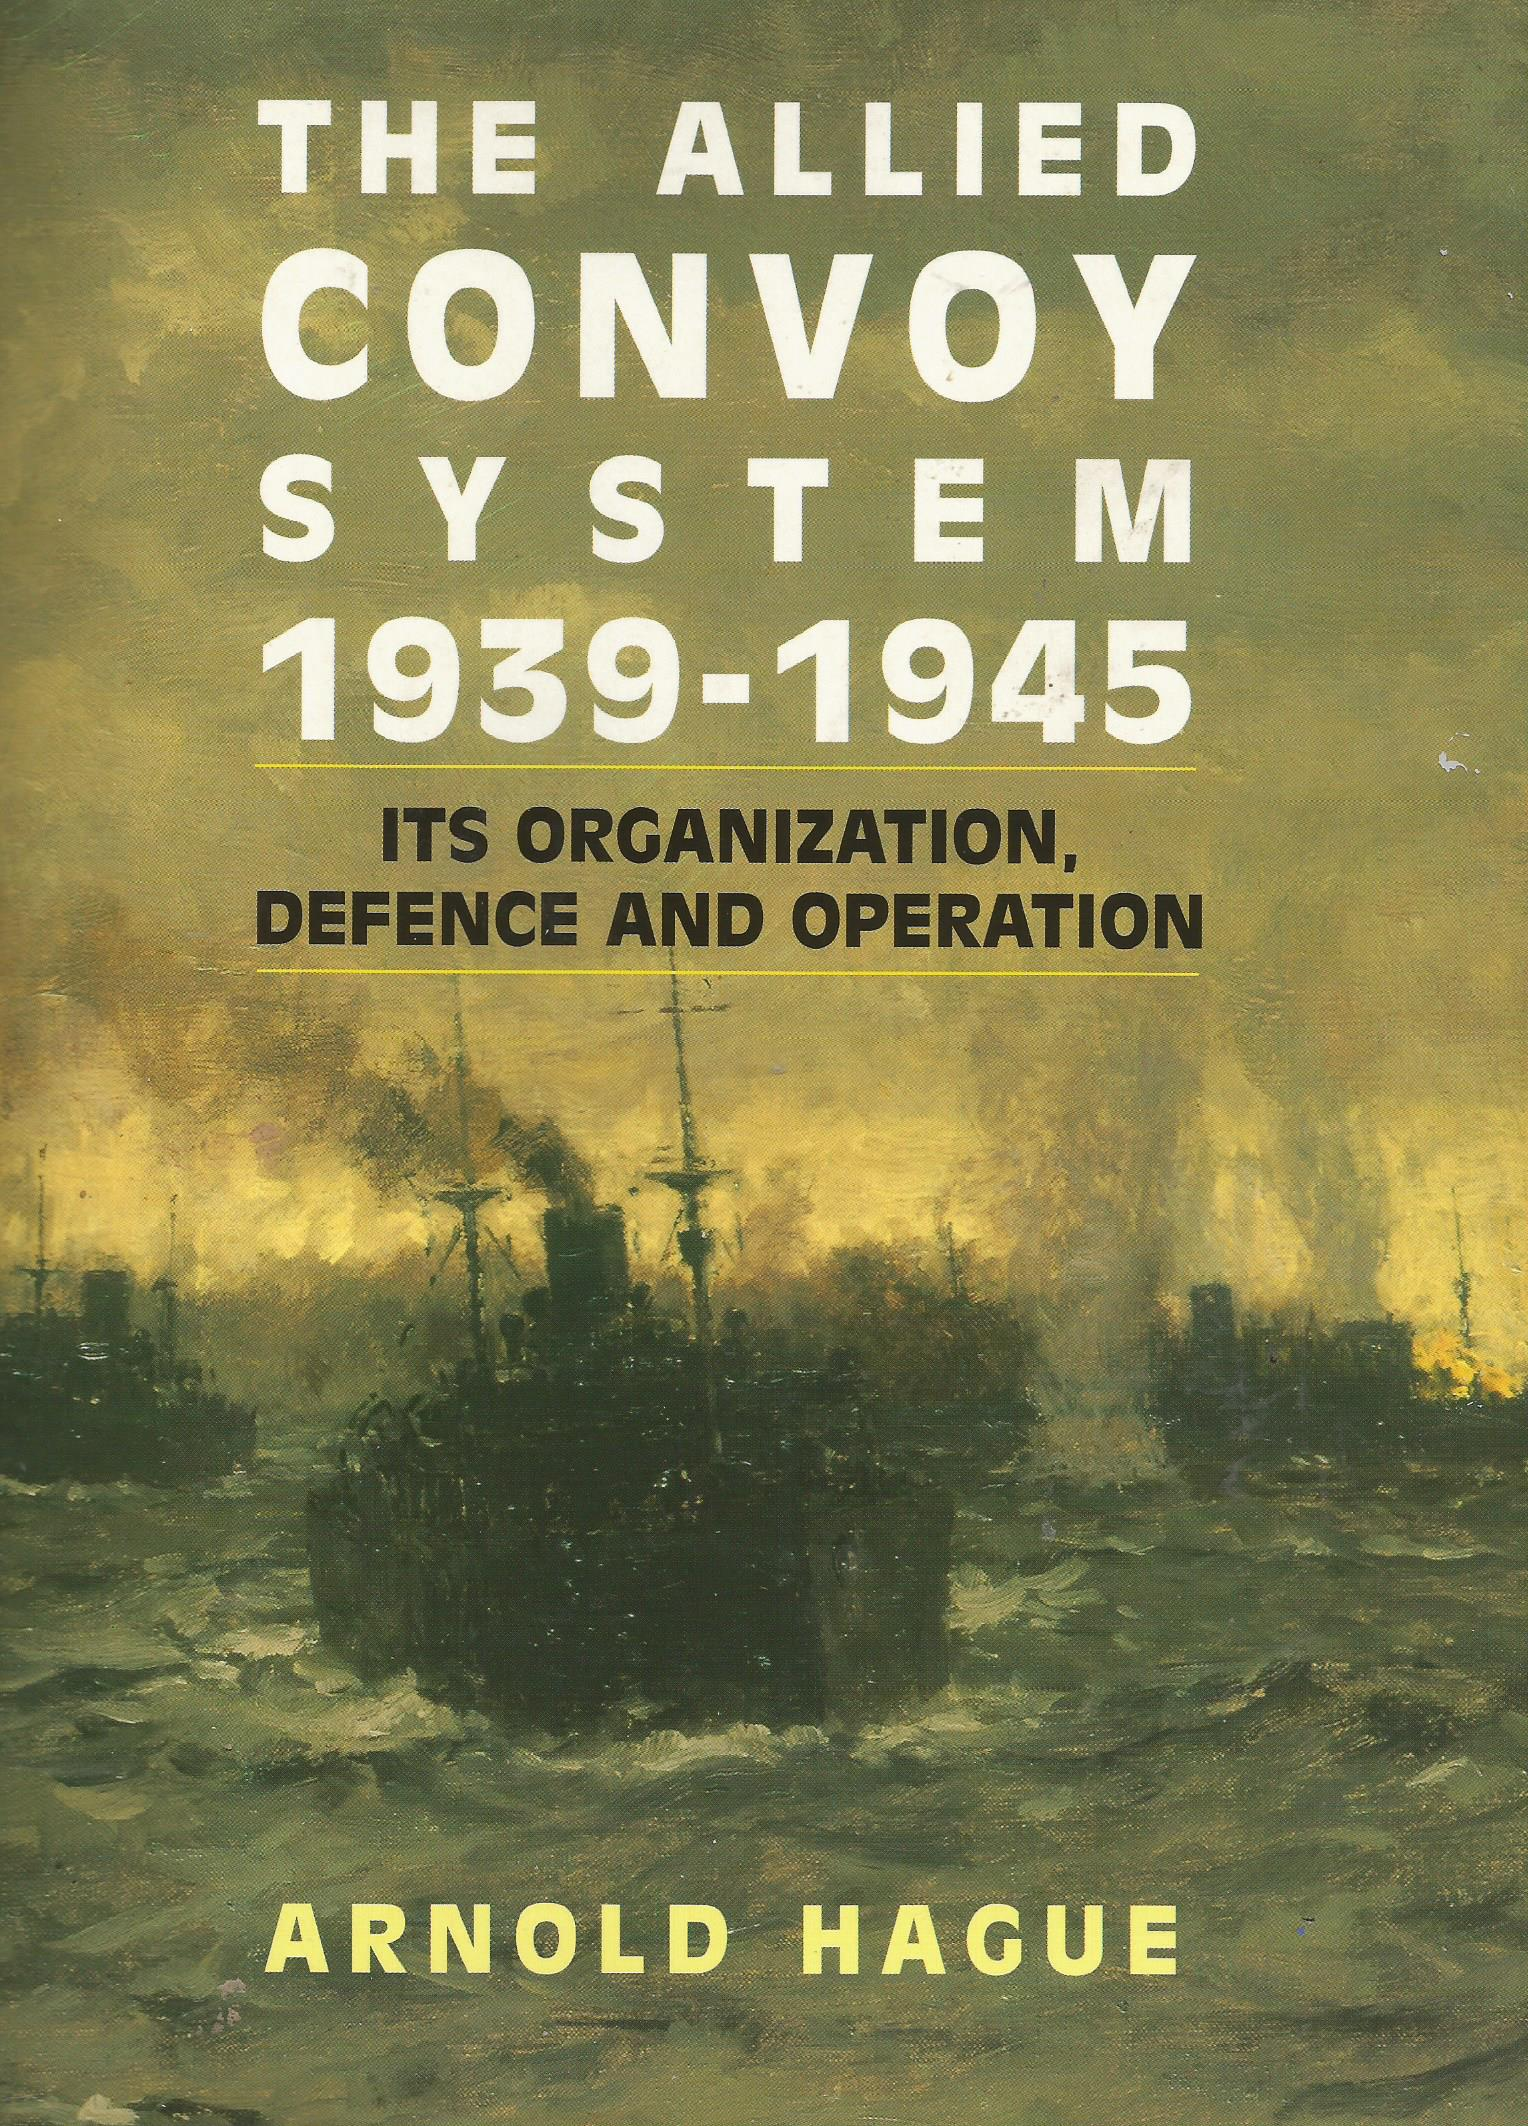 Kriegsmarine - Page 20 Convoy10